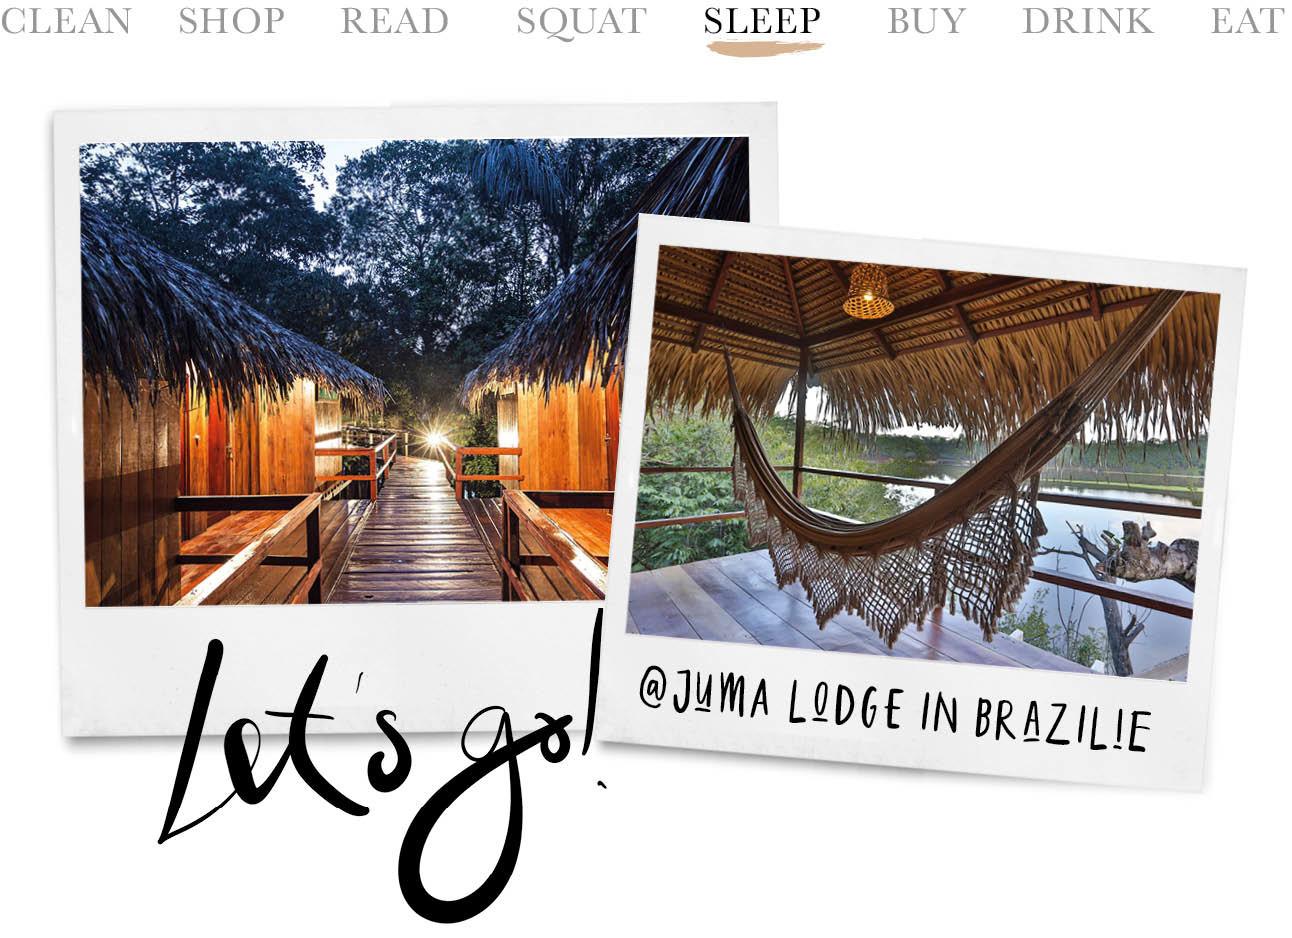 Tropische foto huma logde brazilië